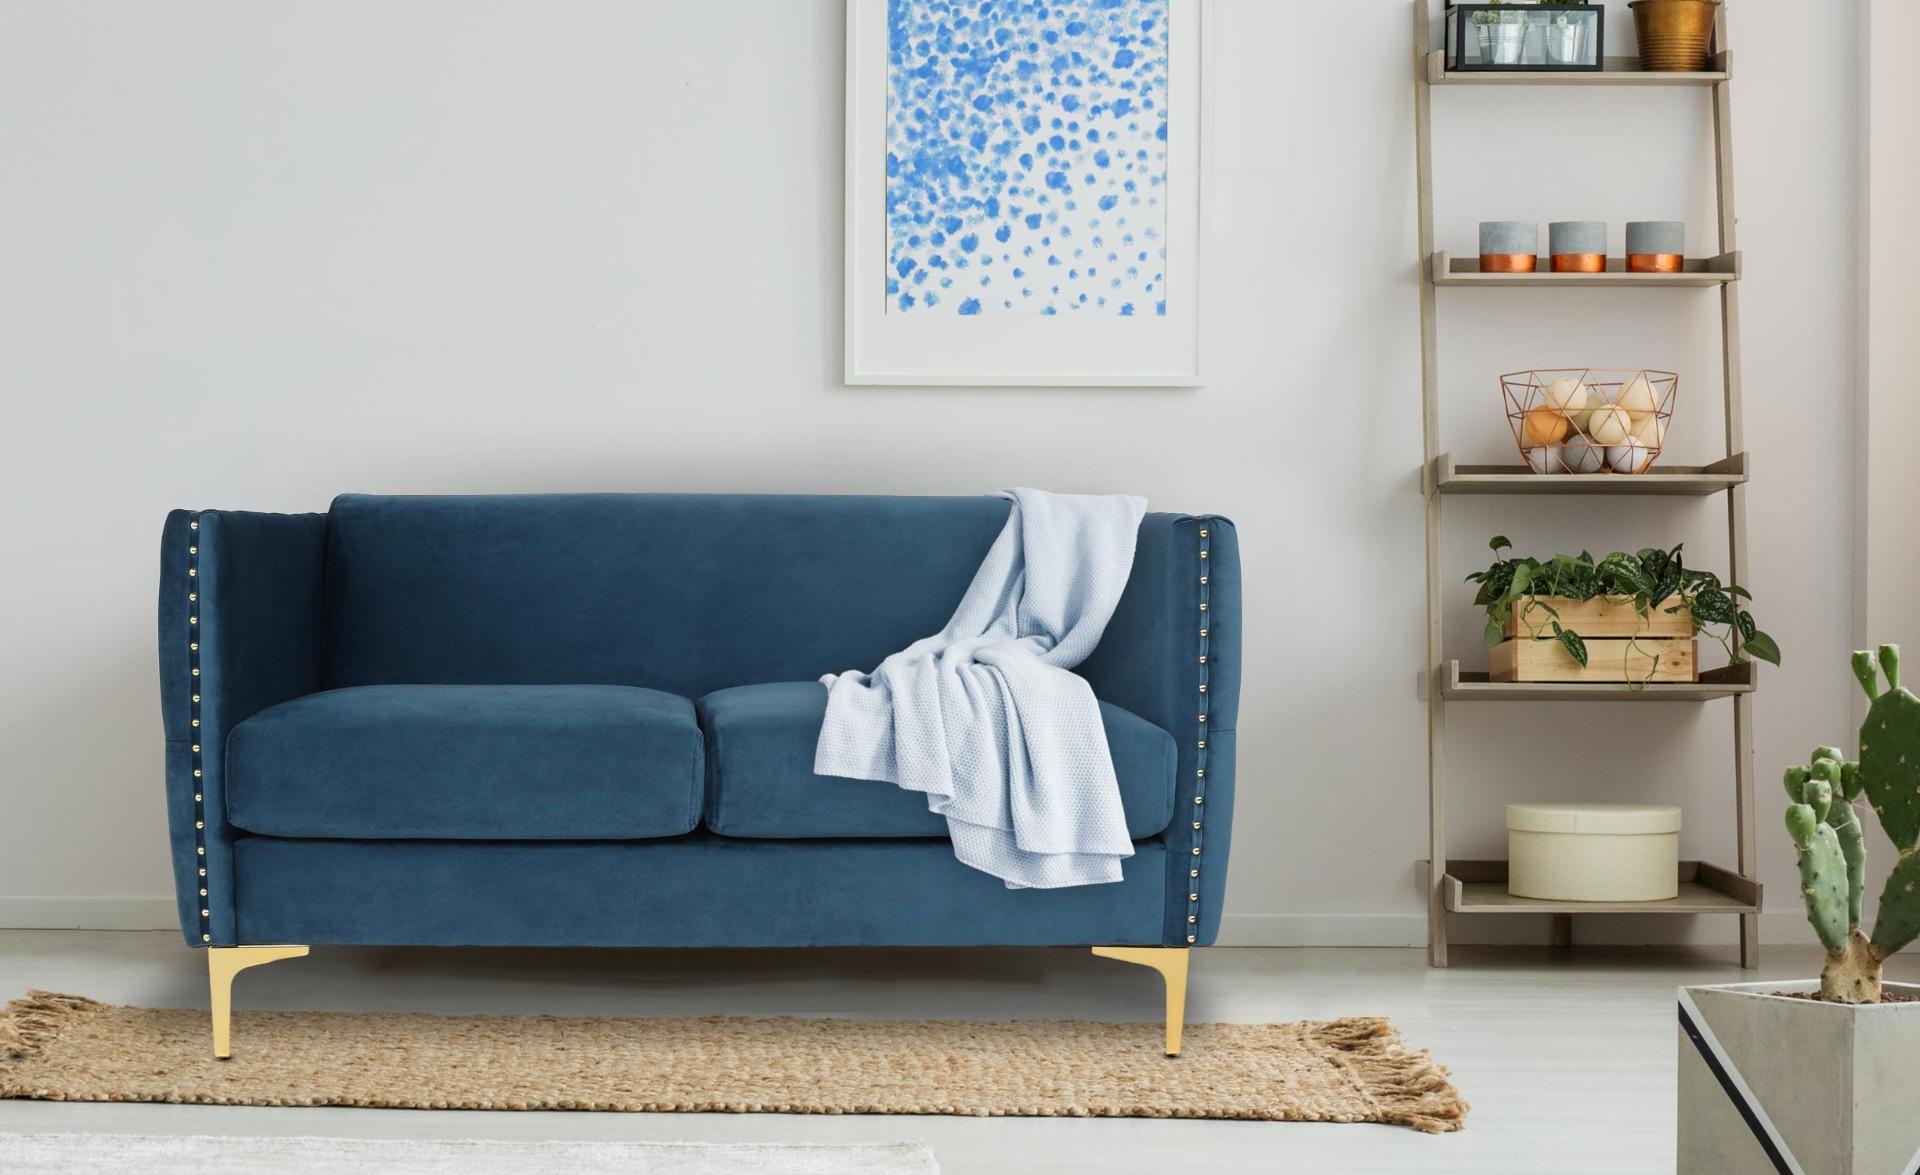 Joshua 2-Sitzer Sofa mit Samtbezug Blau